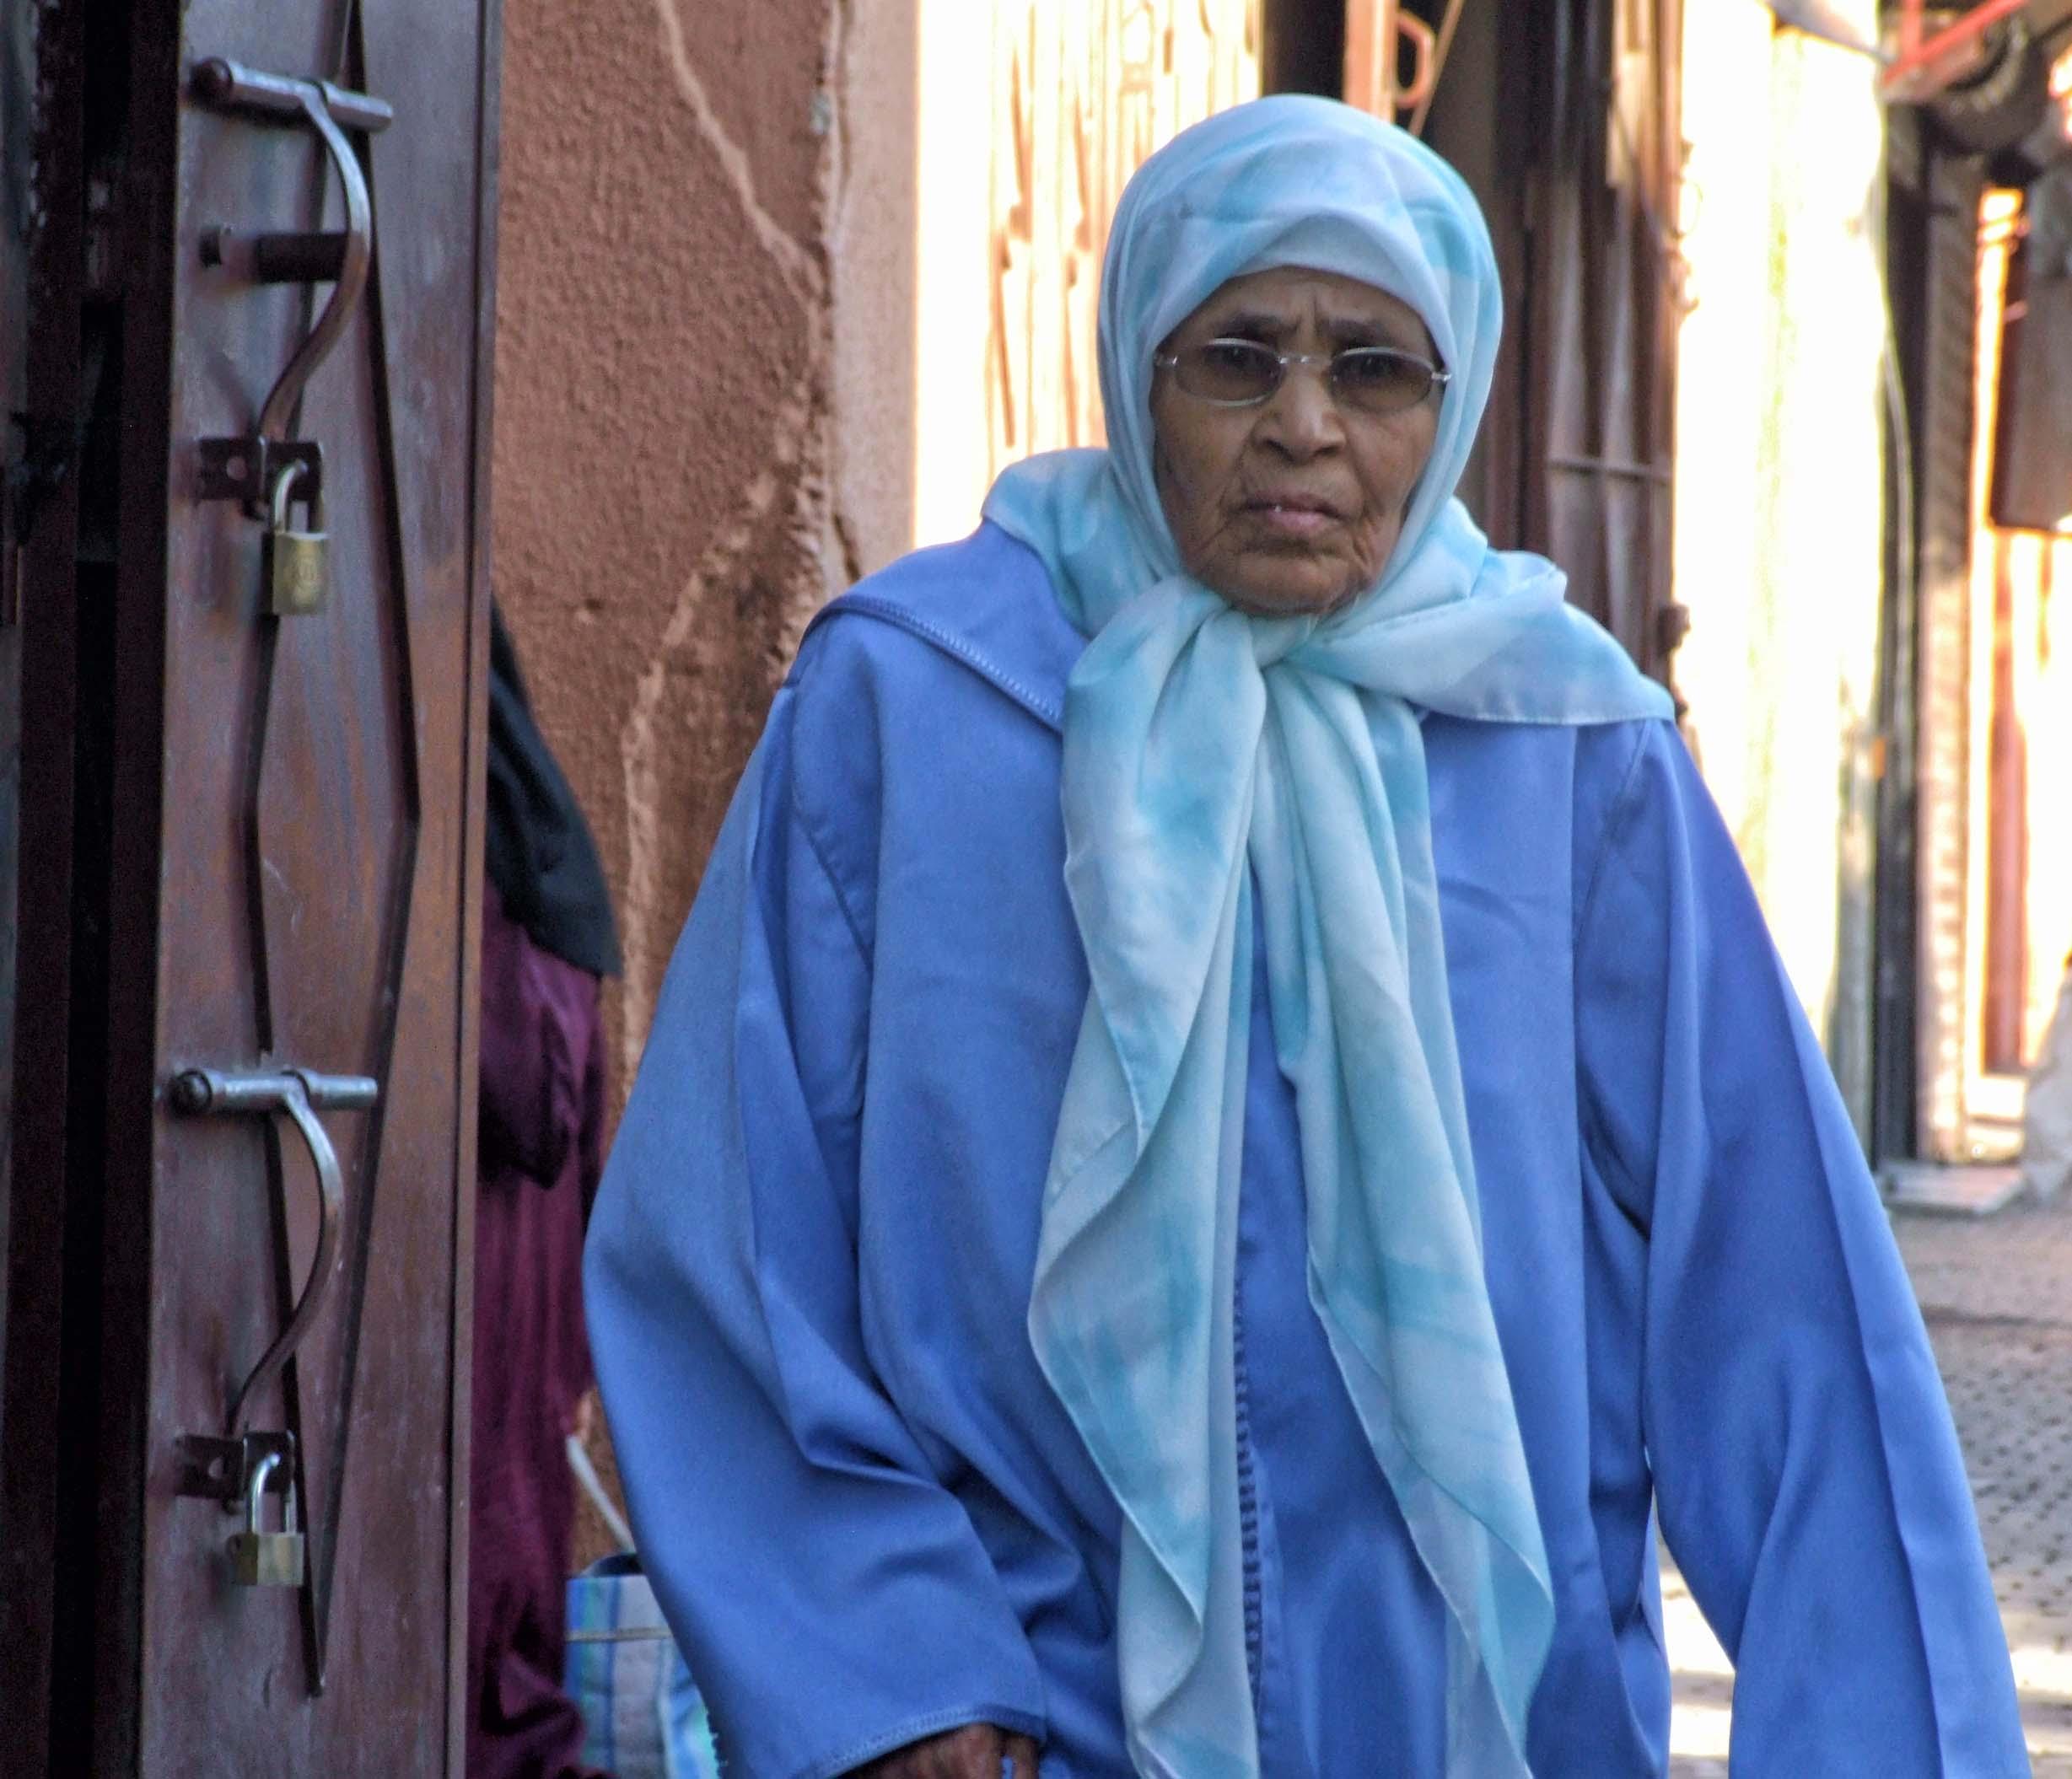 Elderly lady in blue robes